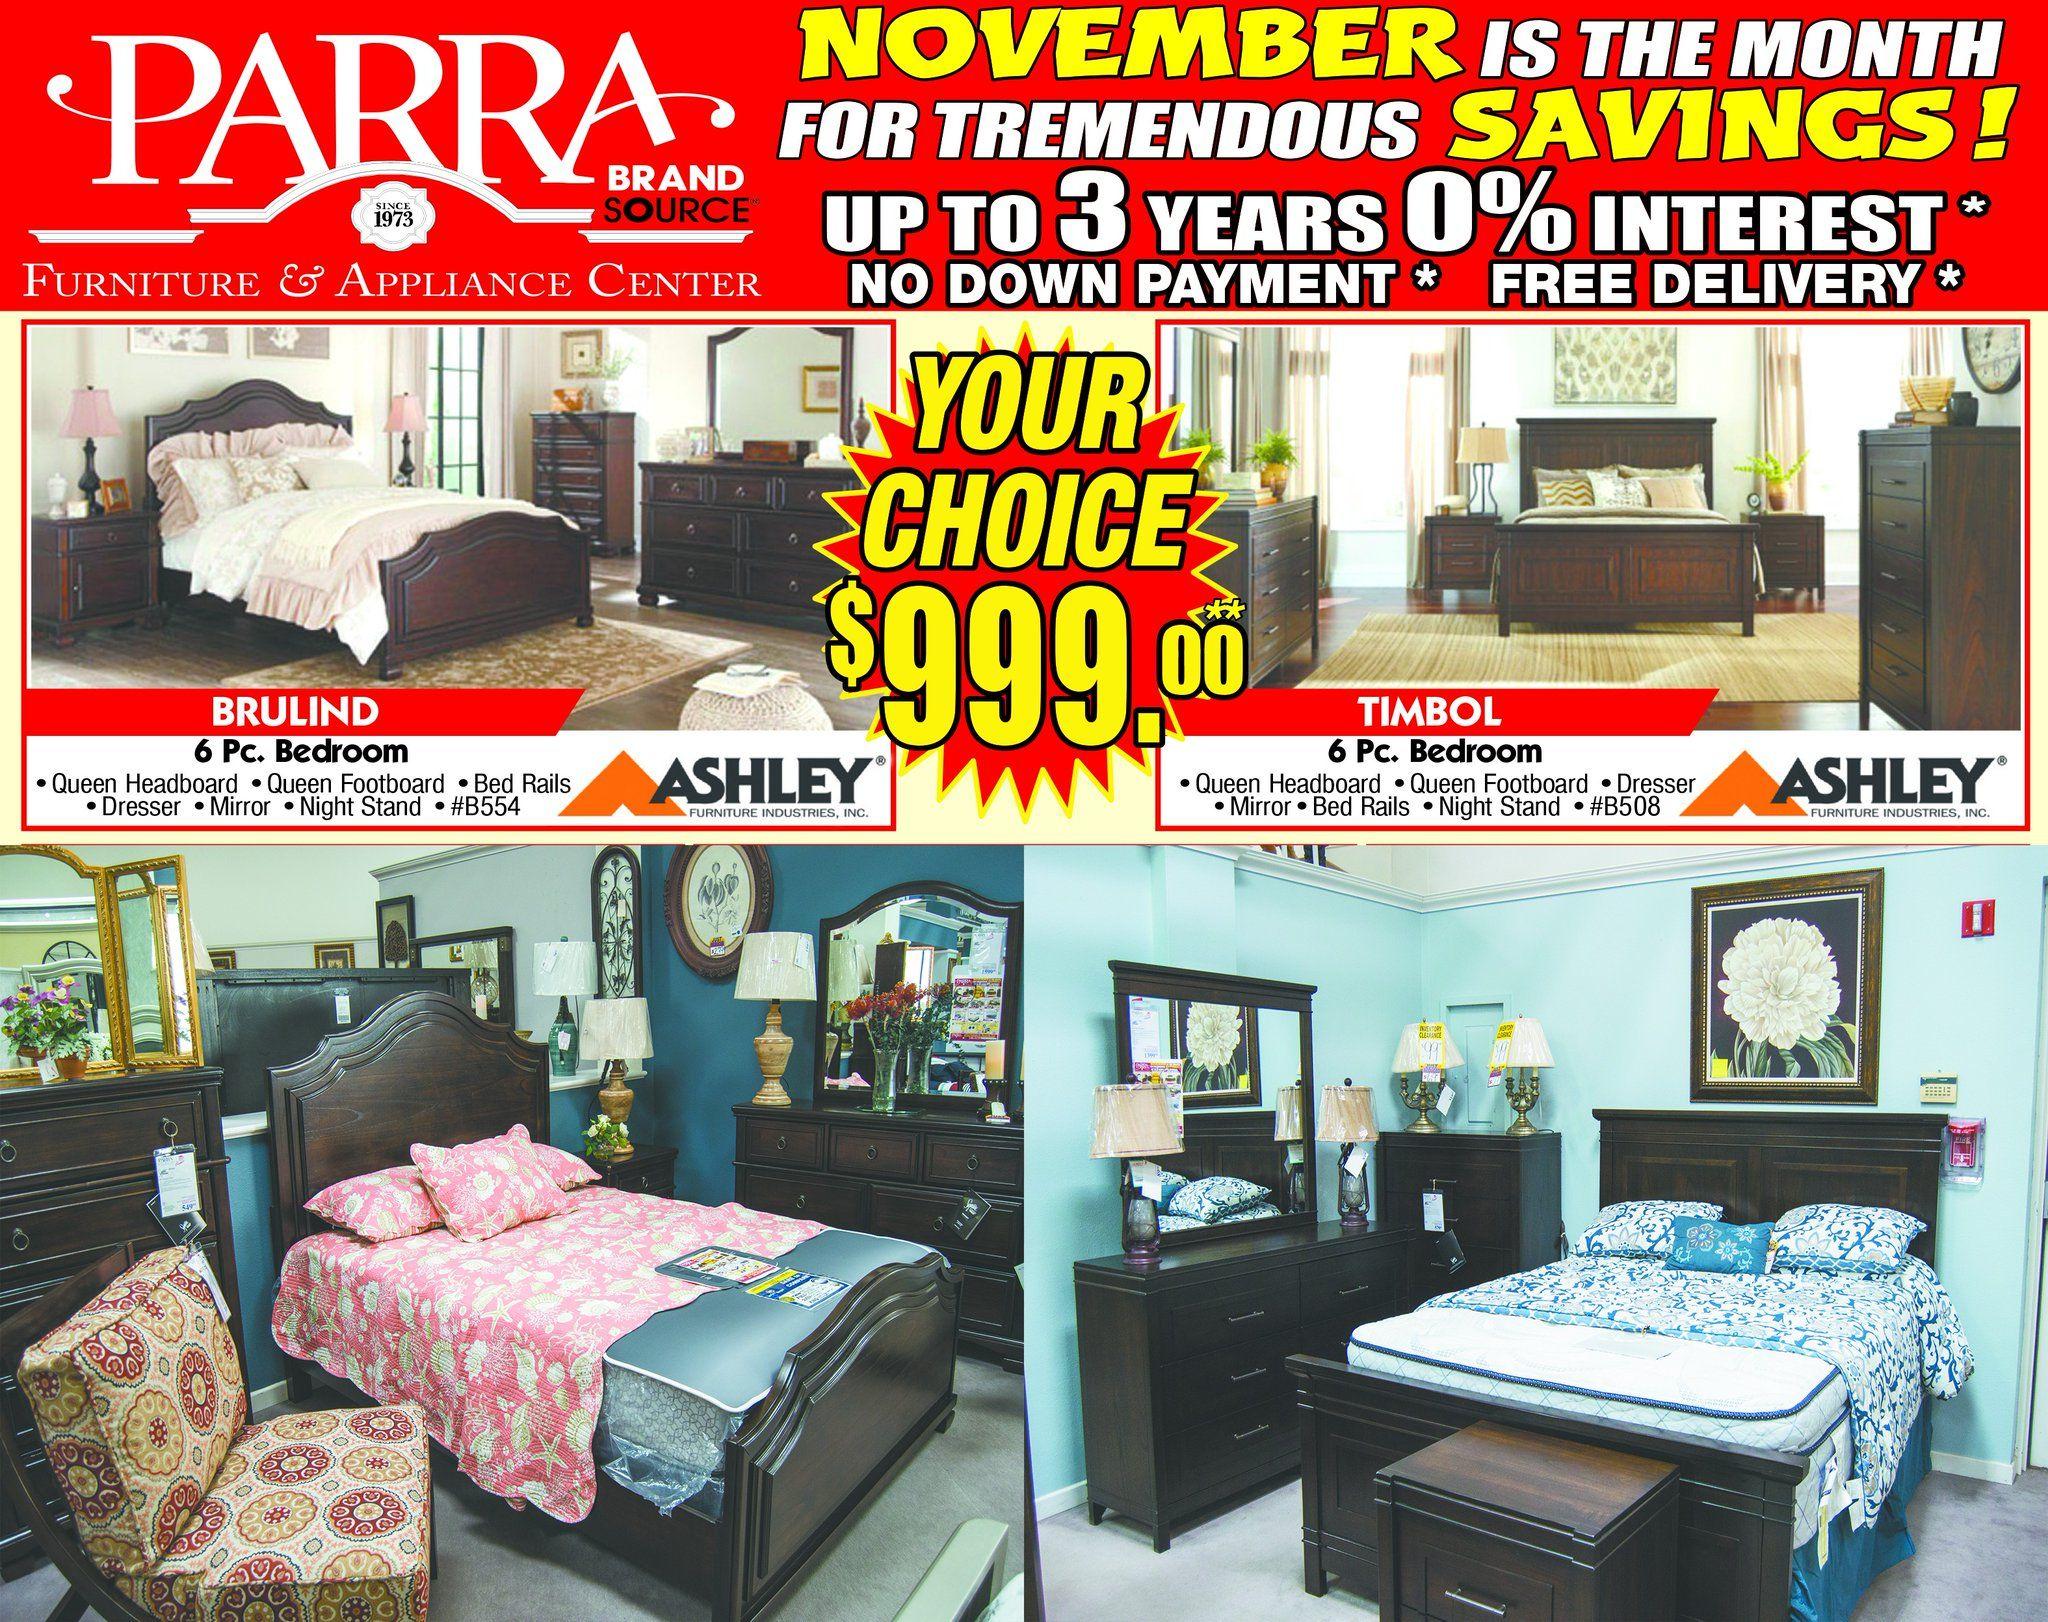 #BlackFriday Special! Full Bedroom For Only $999